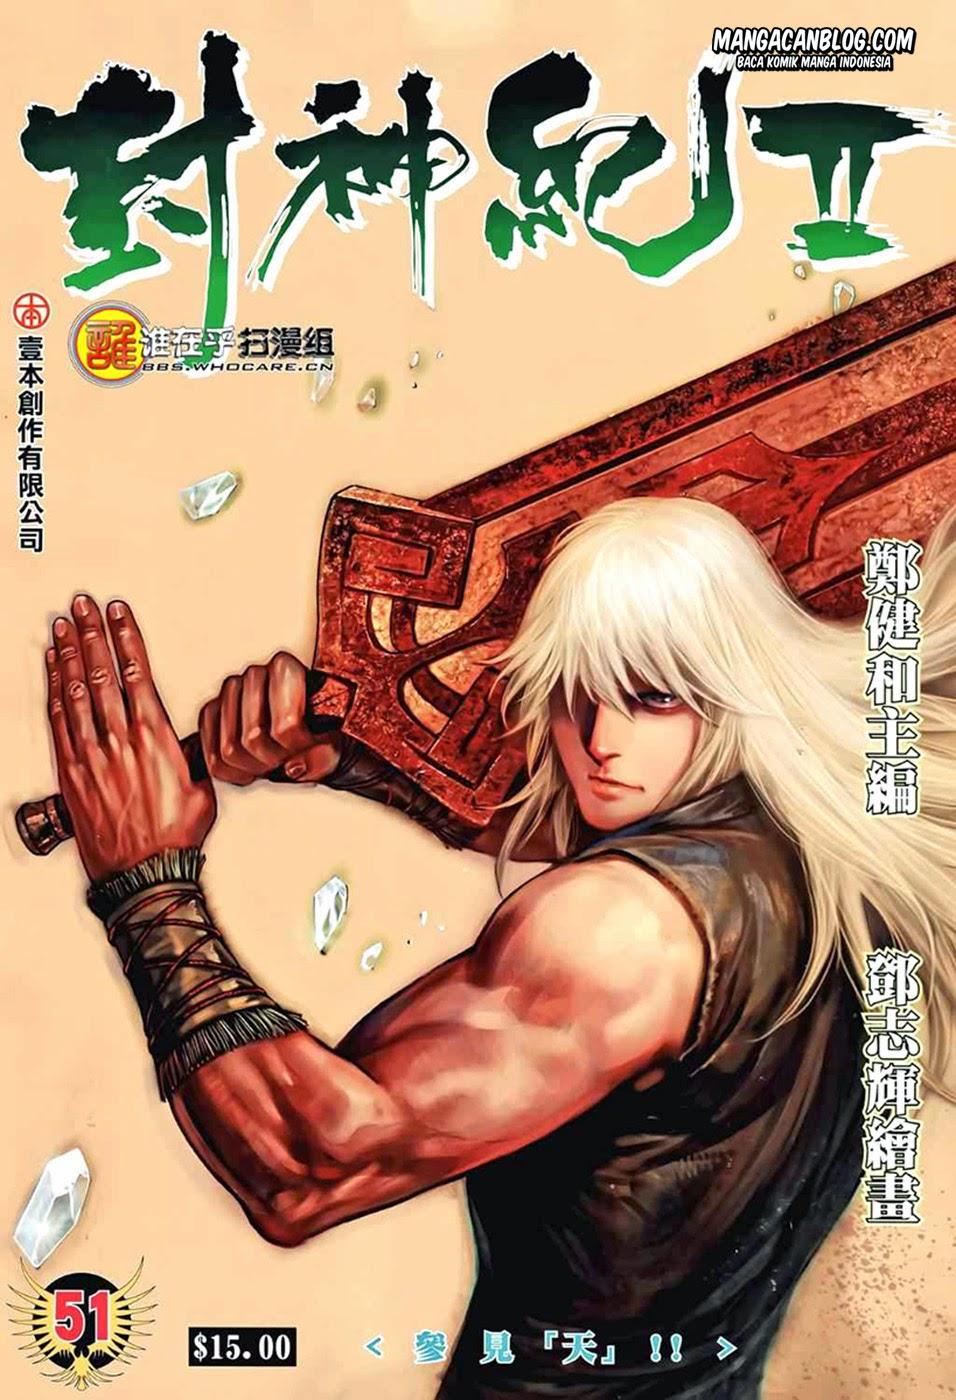 Dilarang COPAS - situs resmi www.mangacanblog.com - Komik feng shen ji 2 051 - bertemu tian 52 Indonesia feng shen ji 2 051 - bertemu tian Terbaru |Baca Manga Komik Indonesia|Mangacan